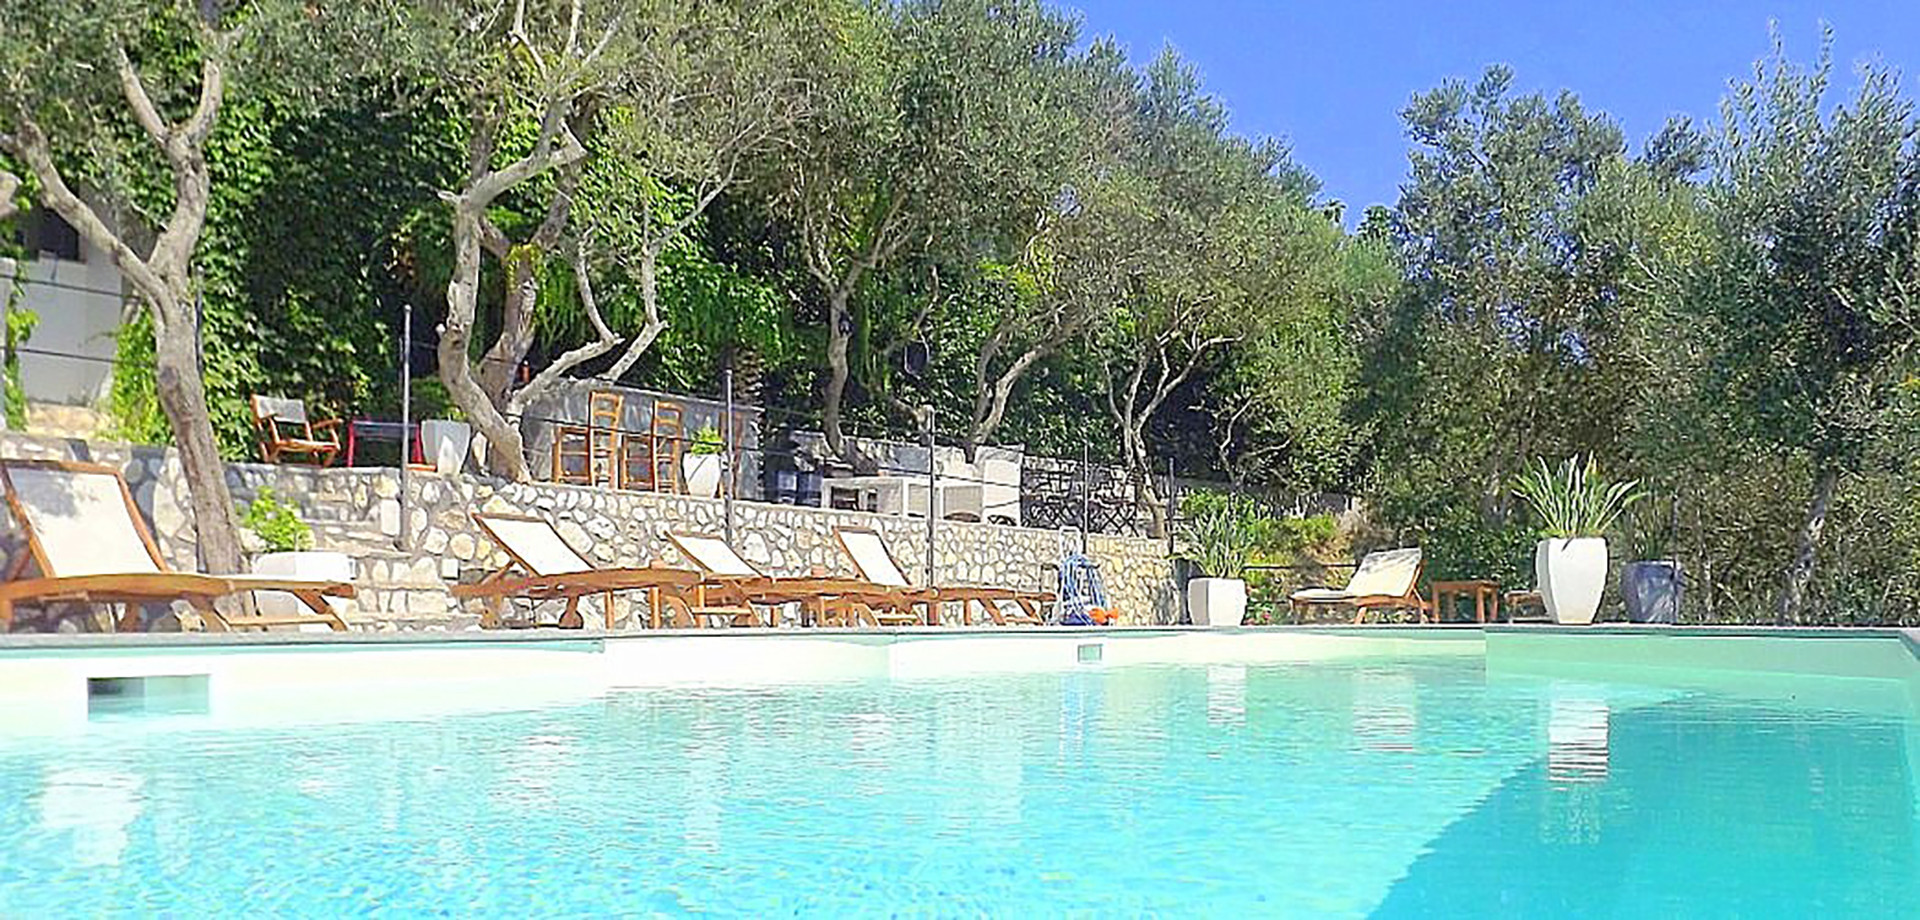 Villa Ulisse Penisola Sorrentina Amore Rentals